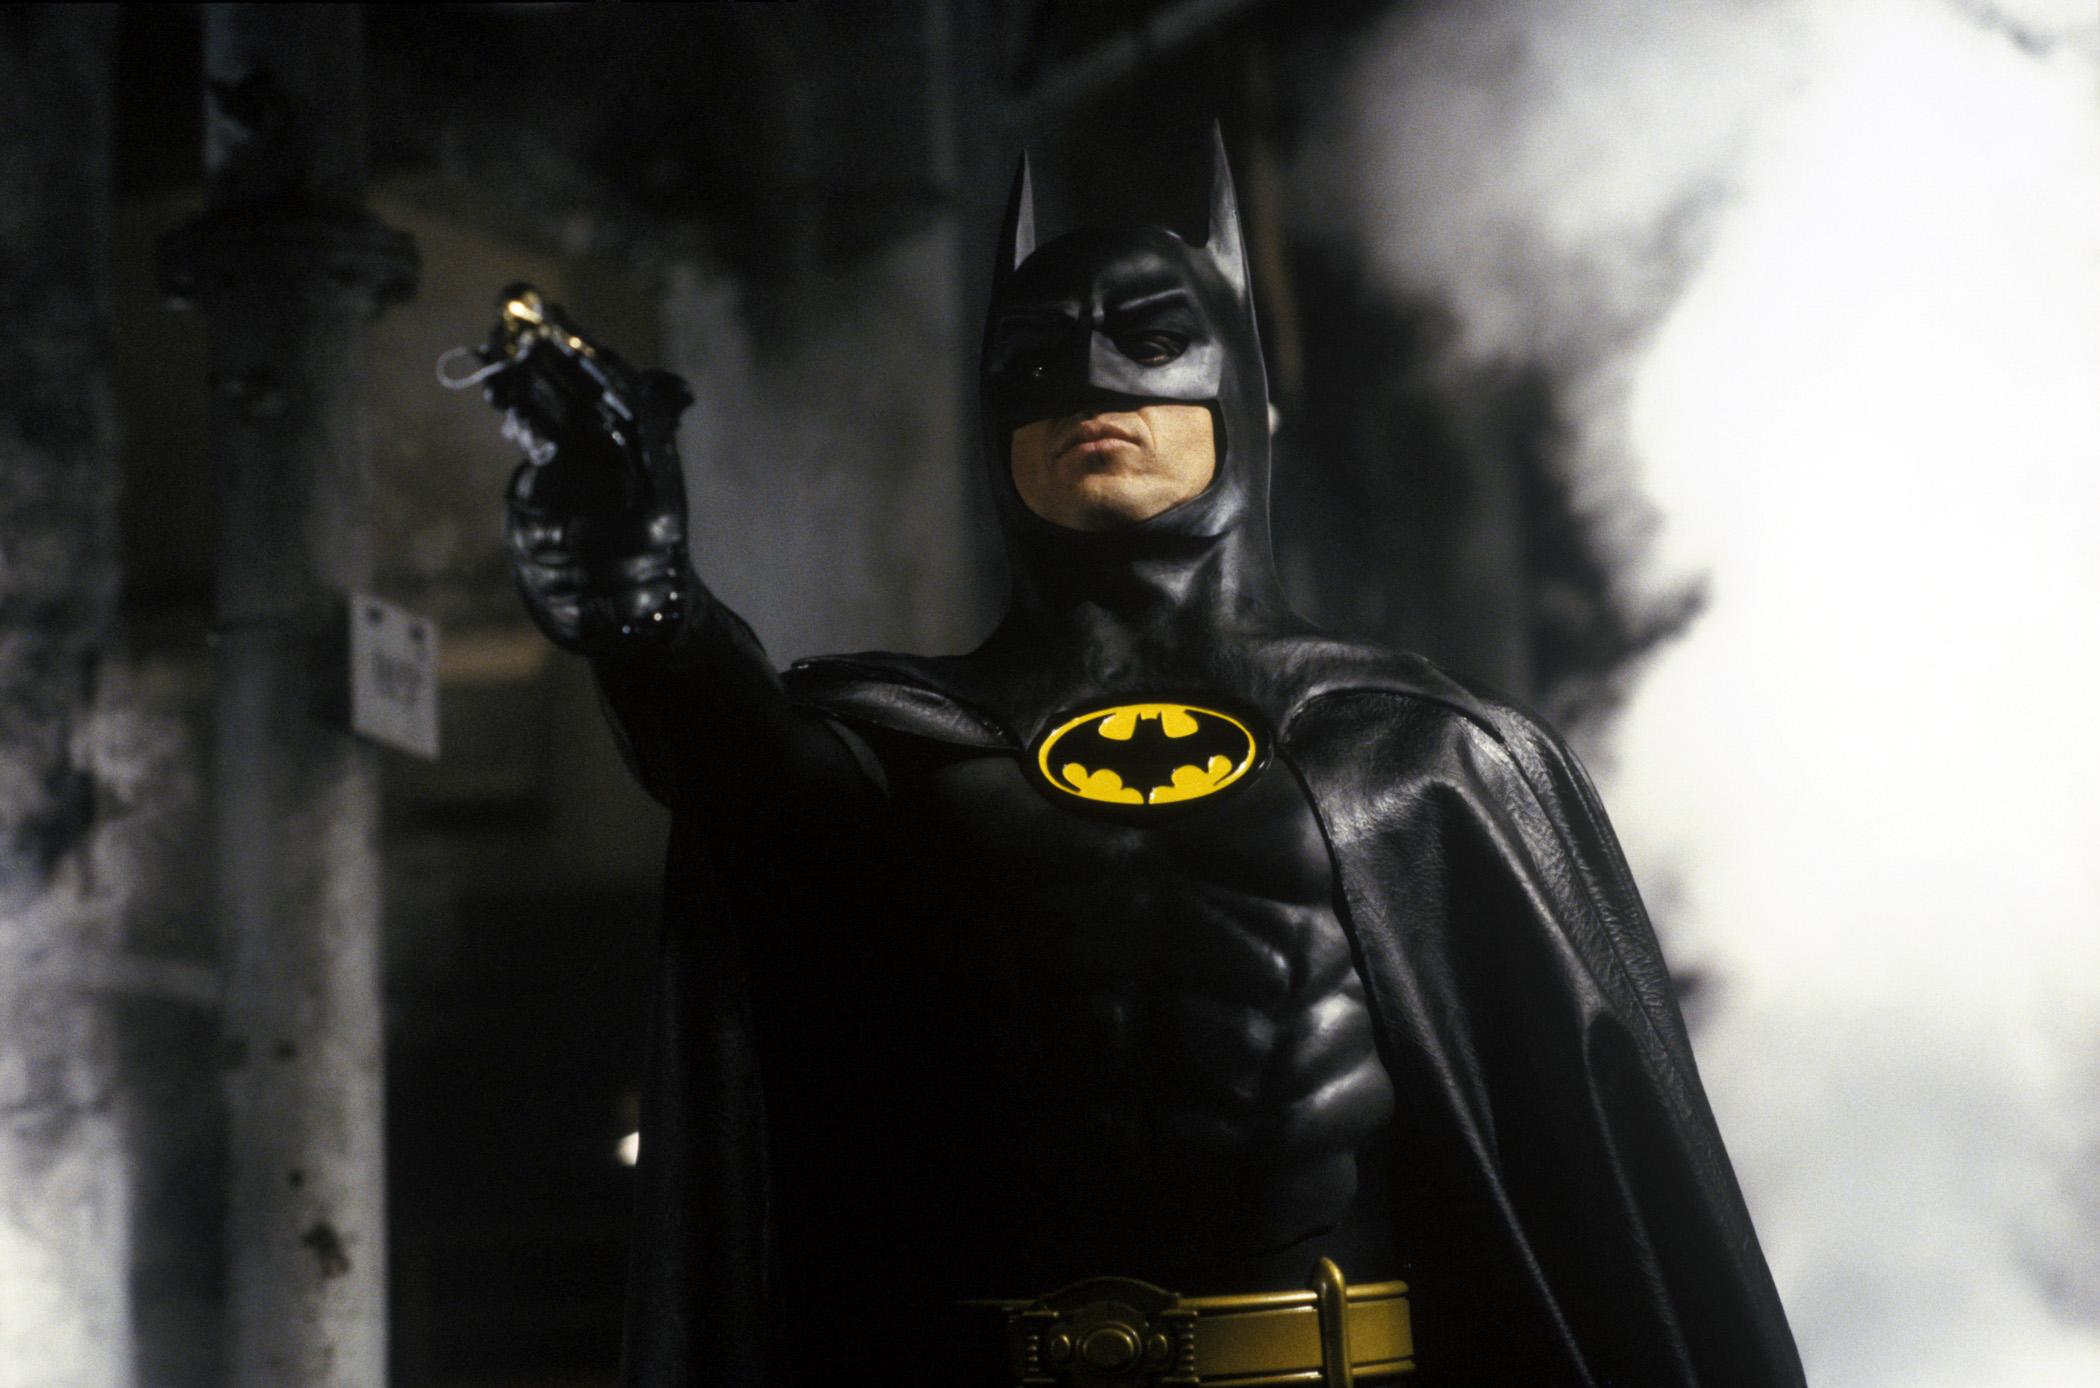 The Flash: Michael Keaton finally returns as Batman!